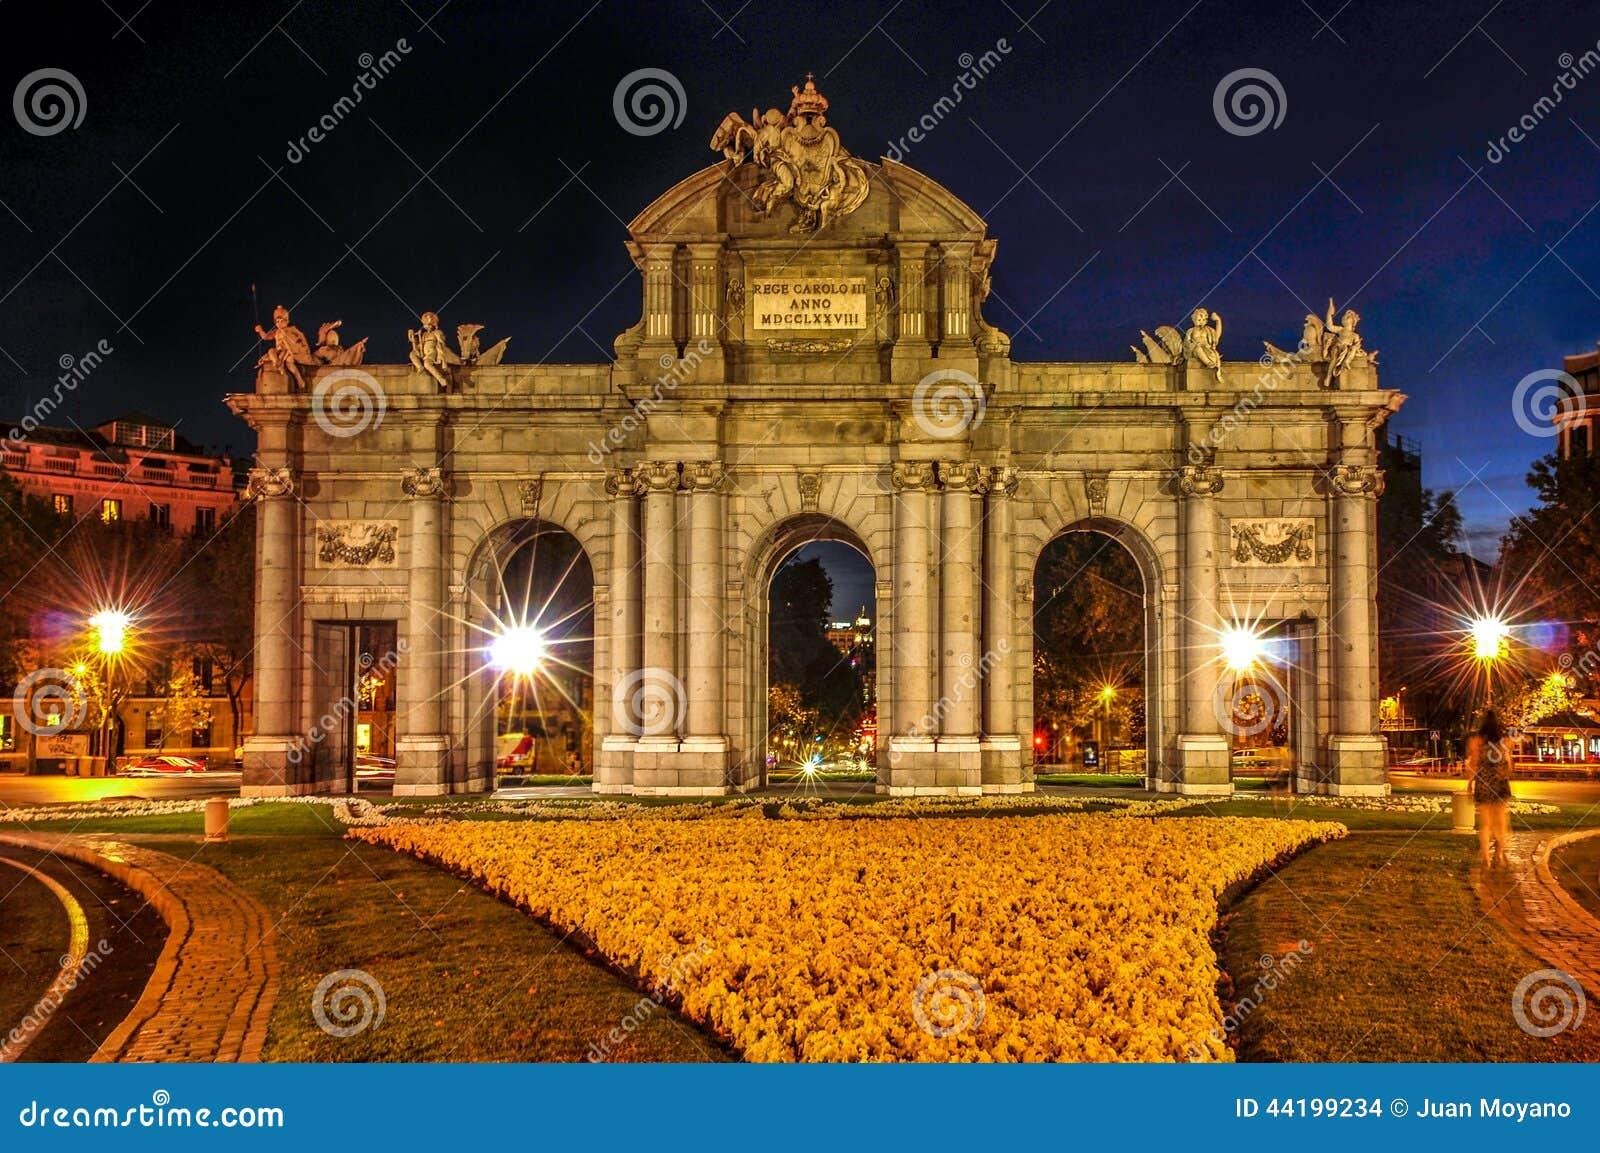 La Puerta De Alcala En Madrid Espa A En La Noche Foto De